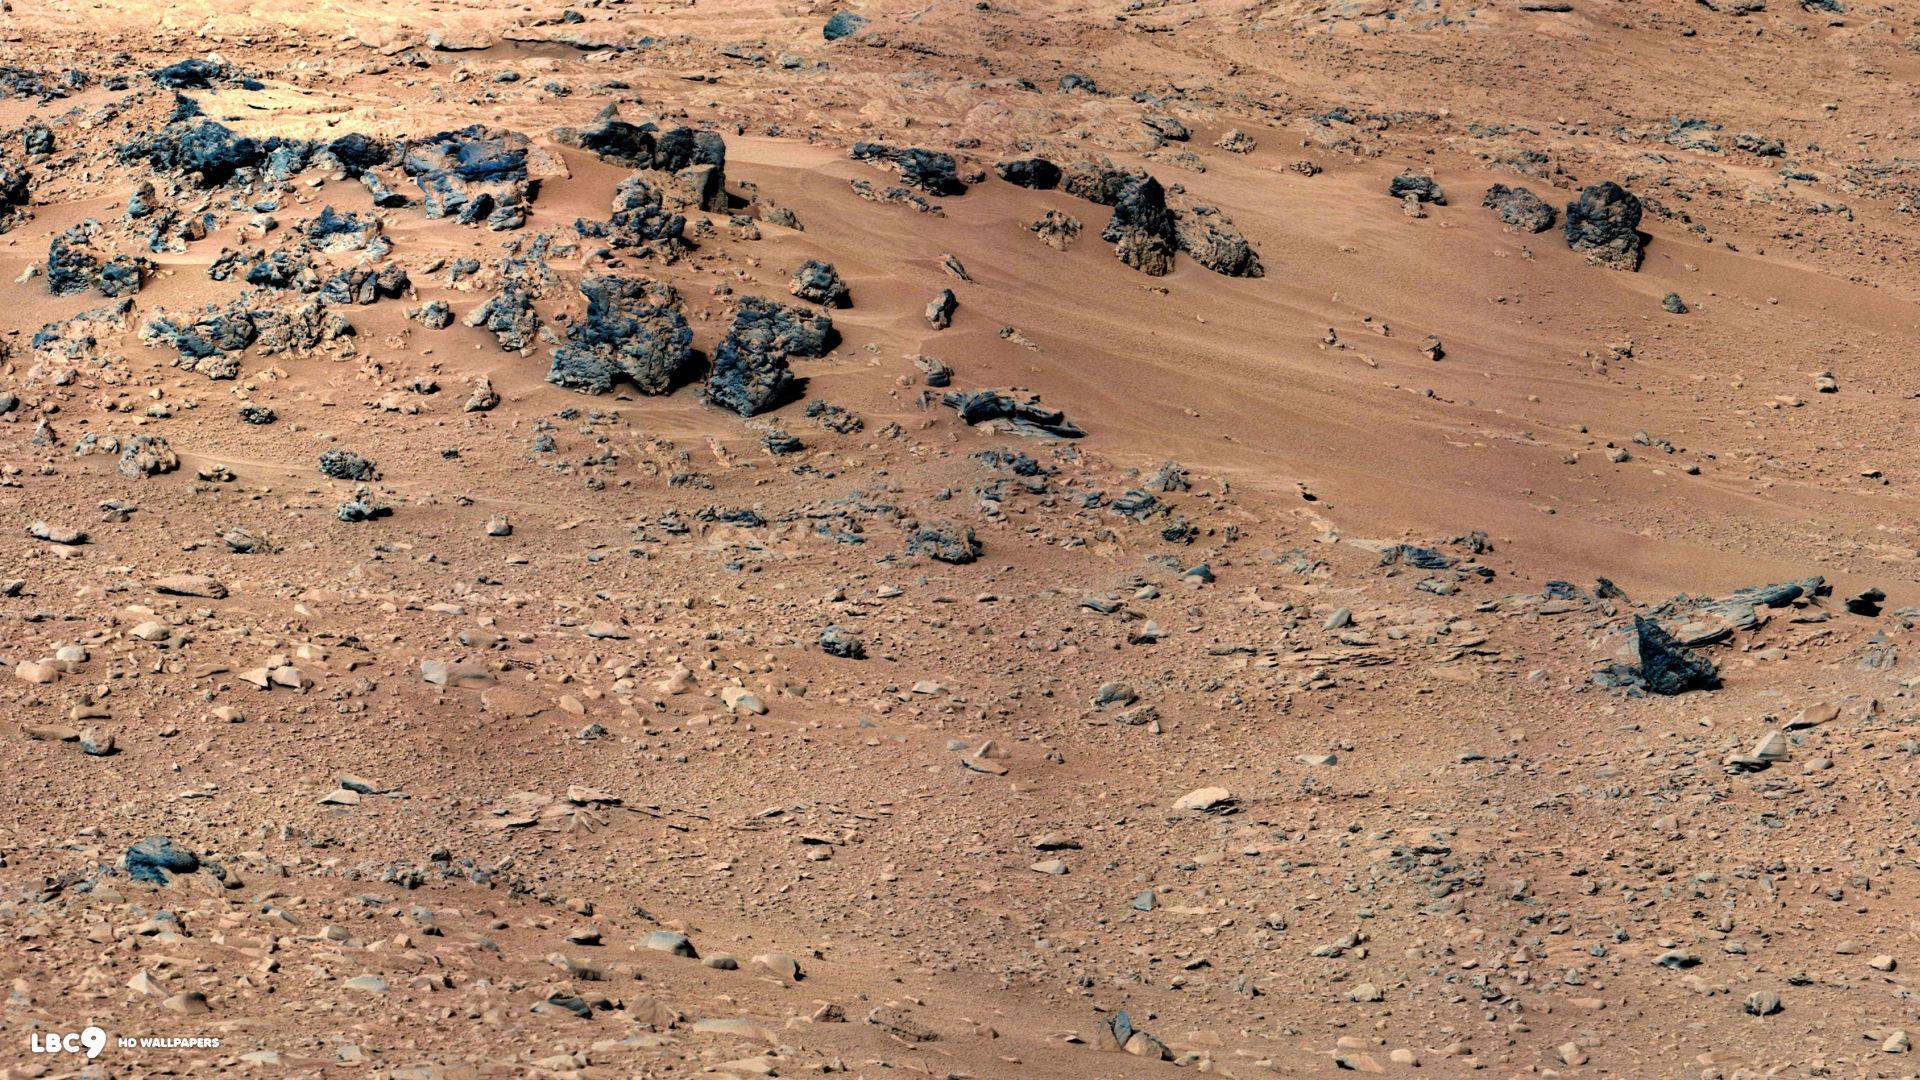 Res: 1920x1080, curiosity rocks mars 1080p